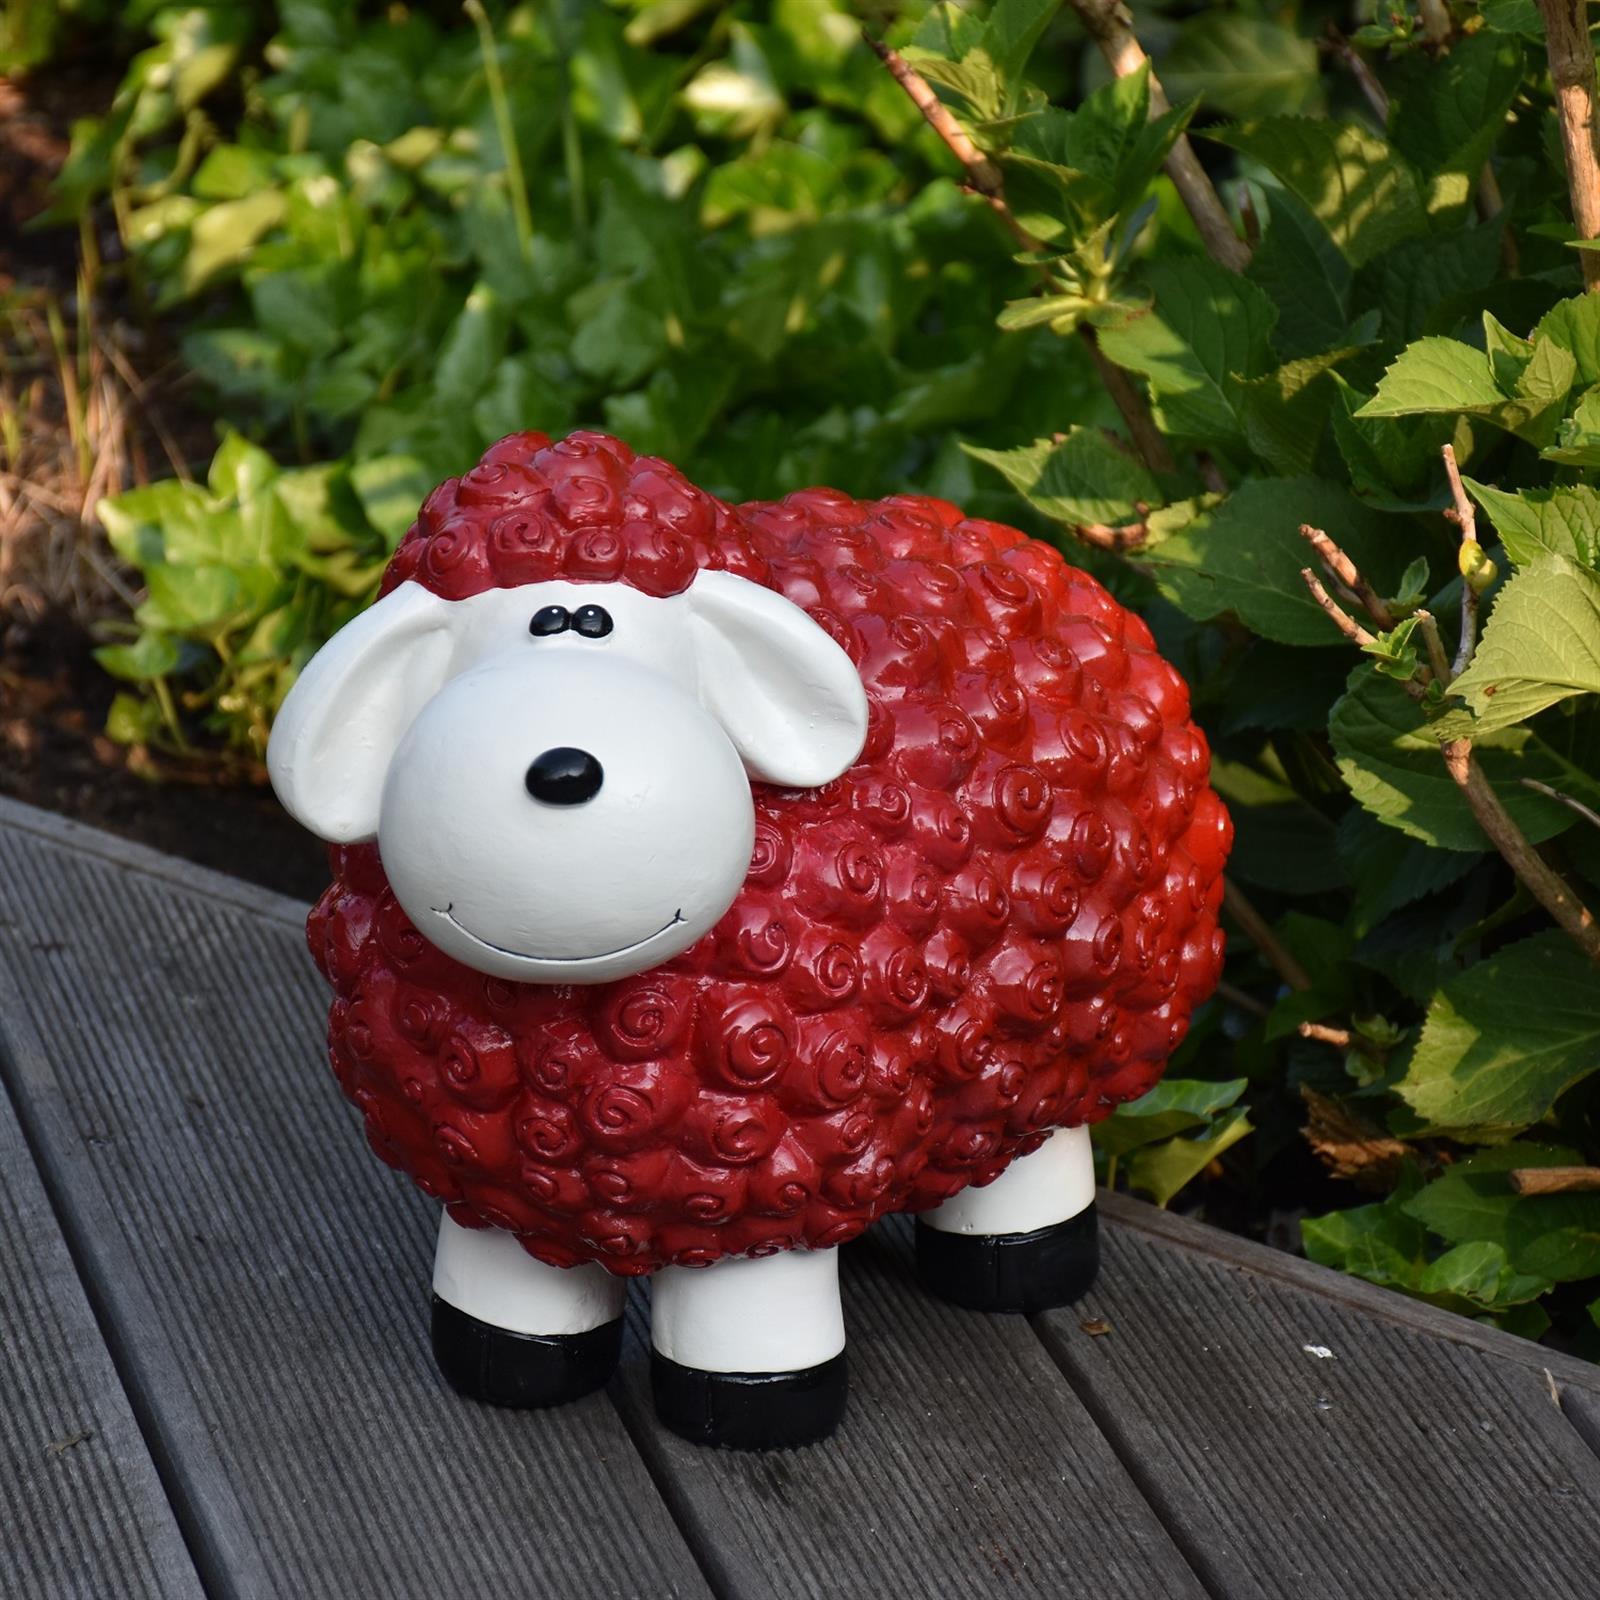 Gartenfigur Schaf in Rot